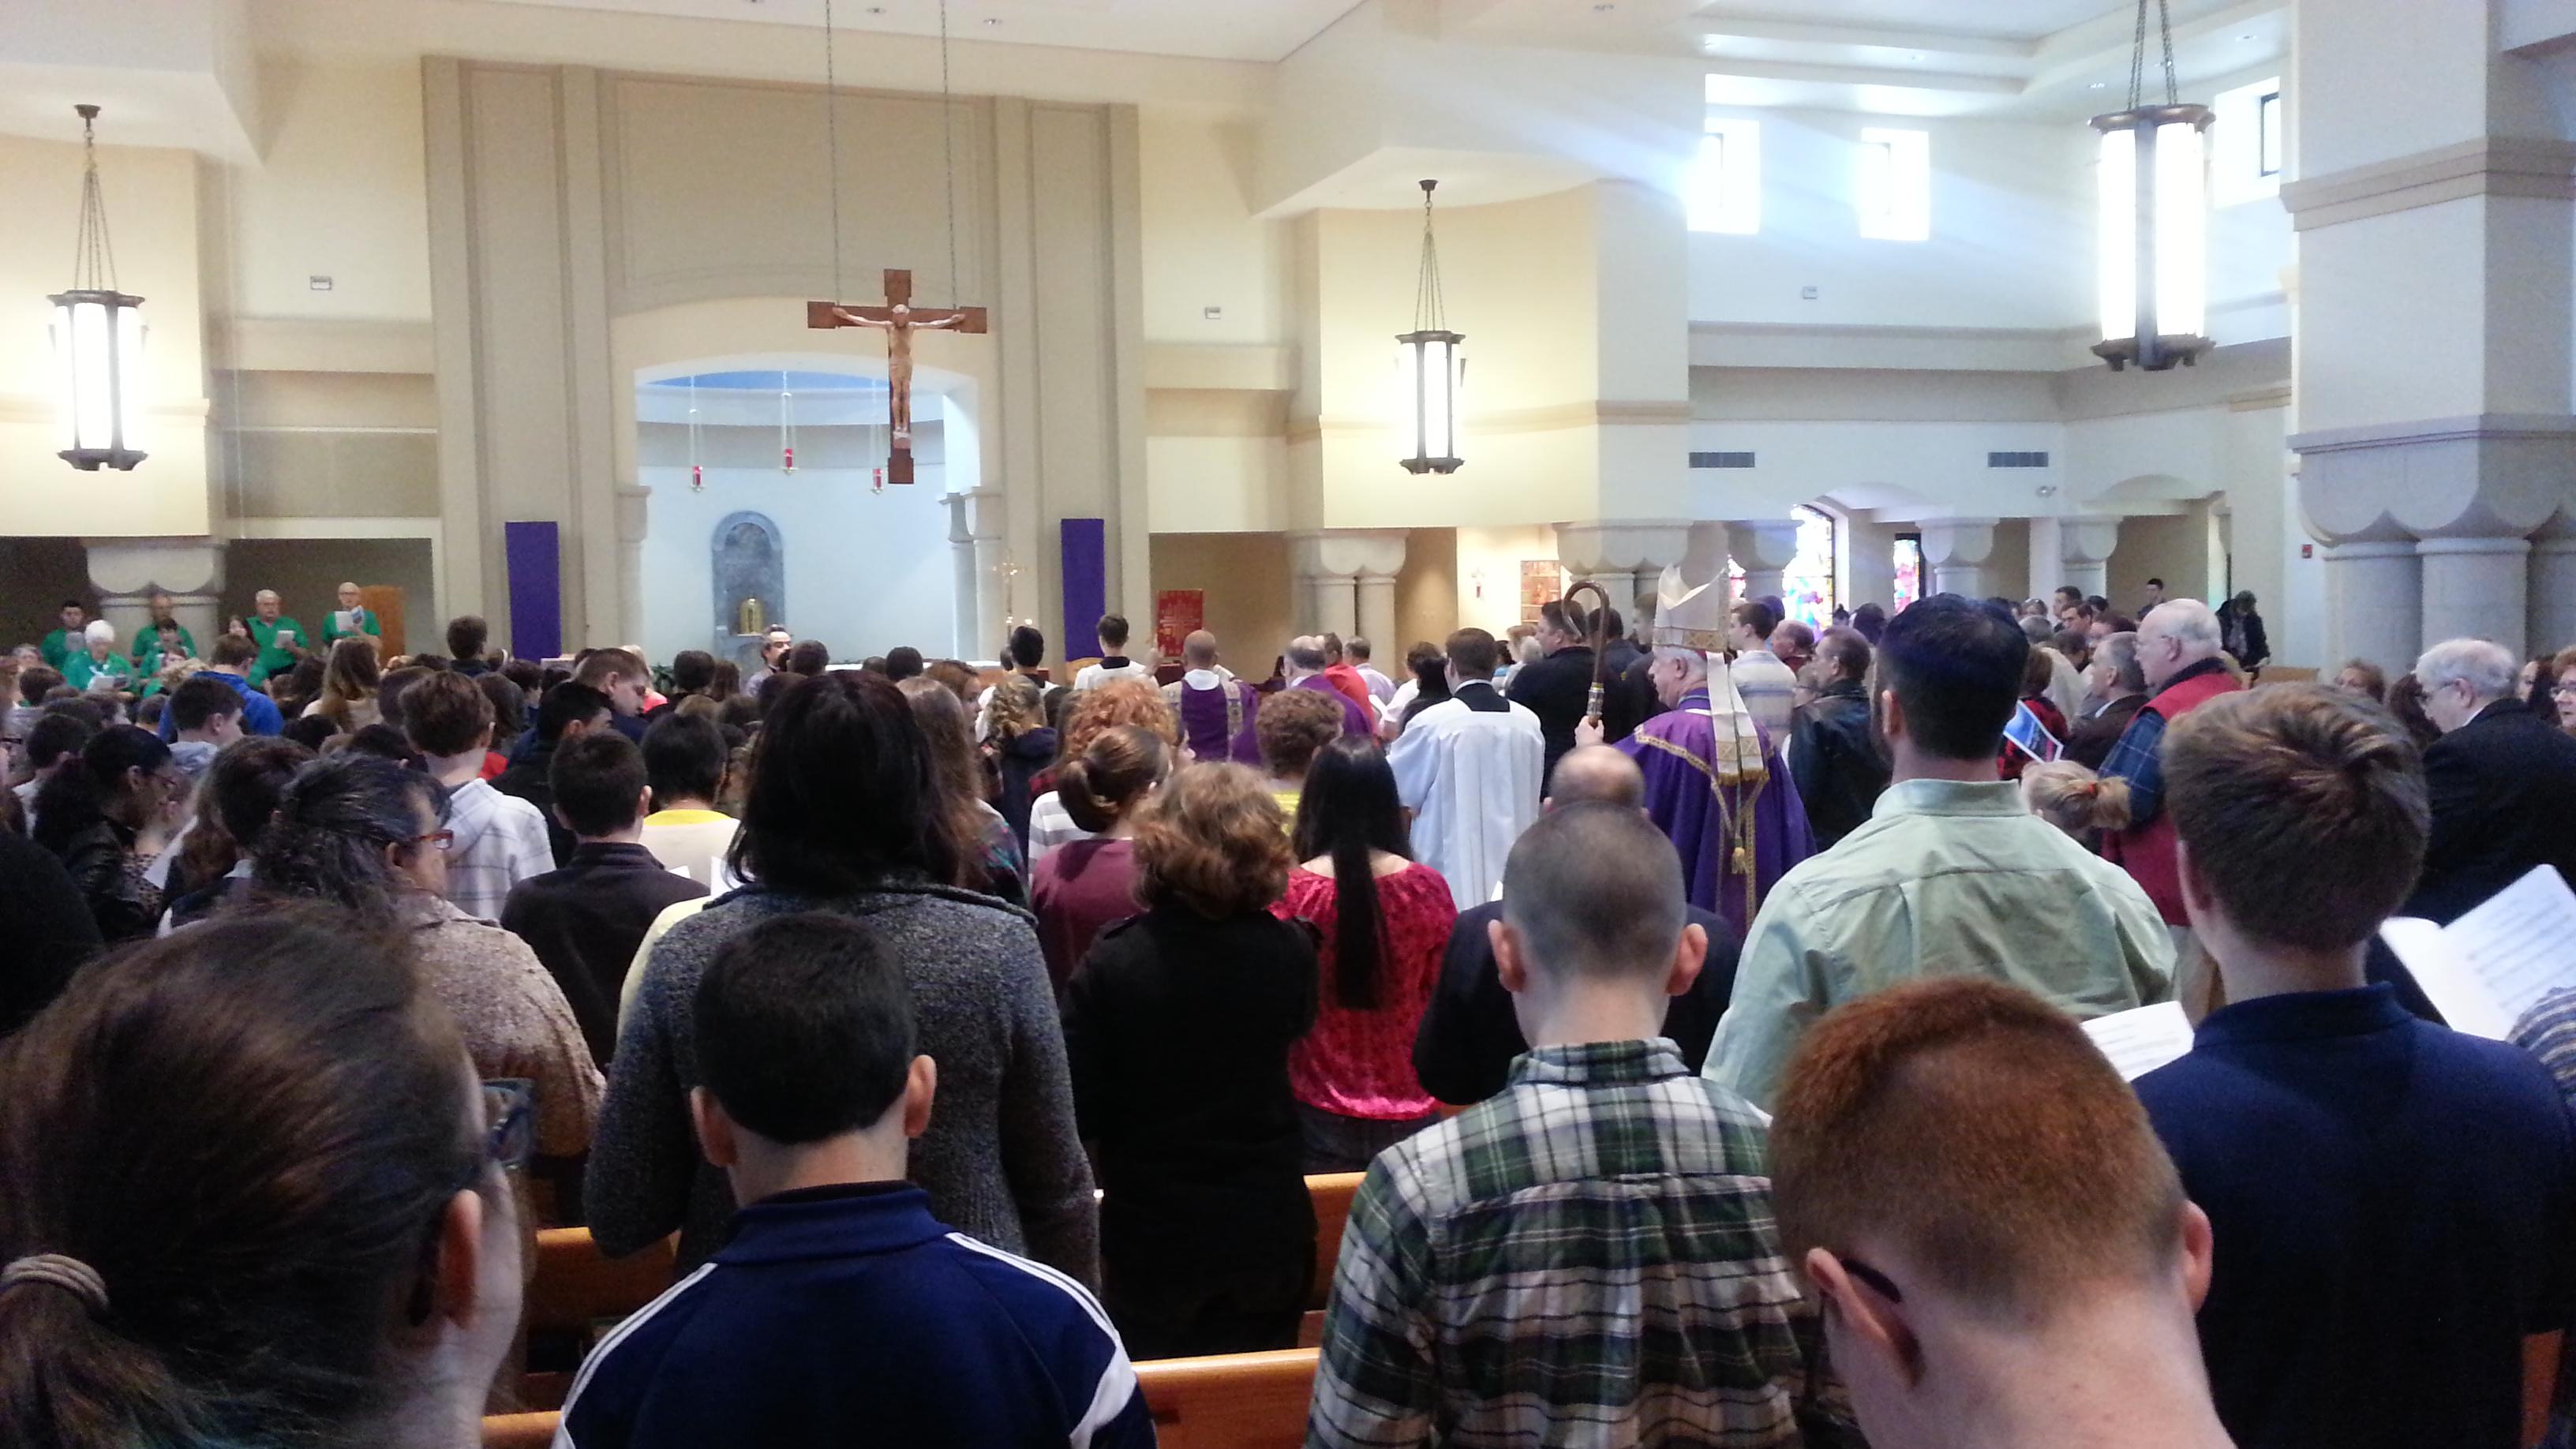 Holy Mass begining